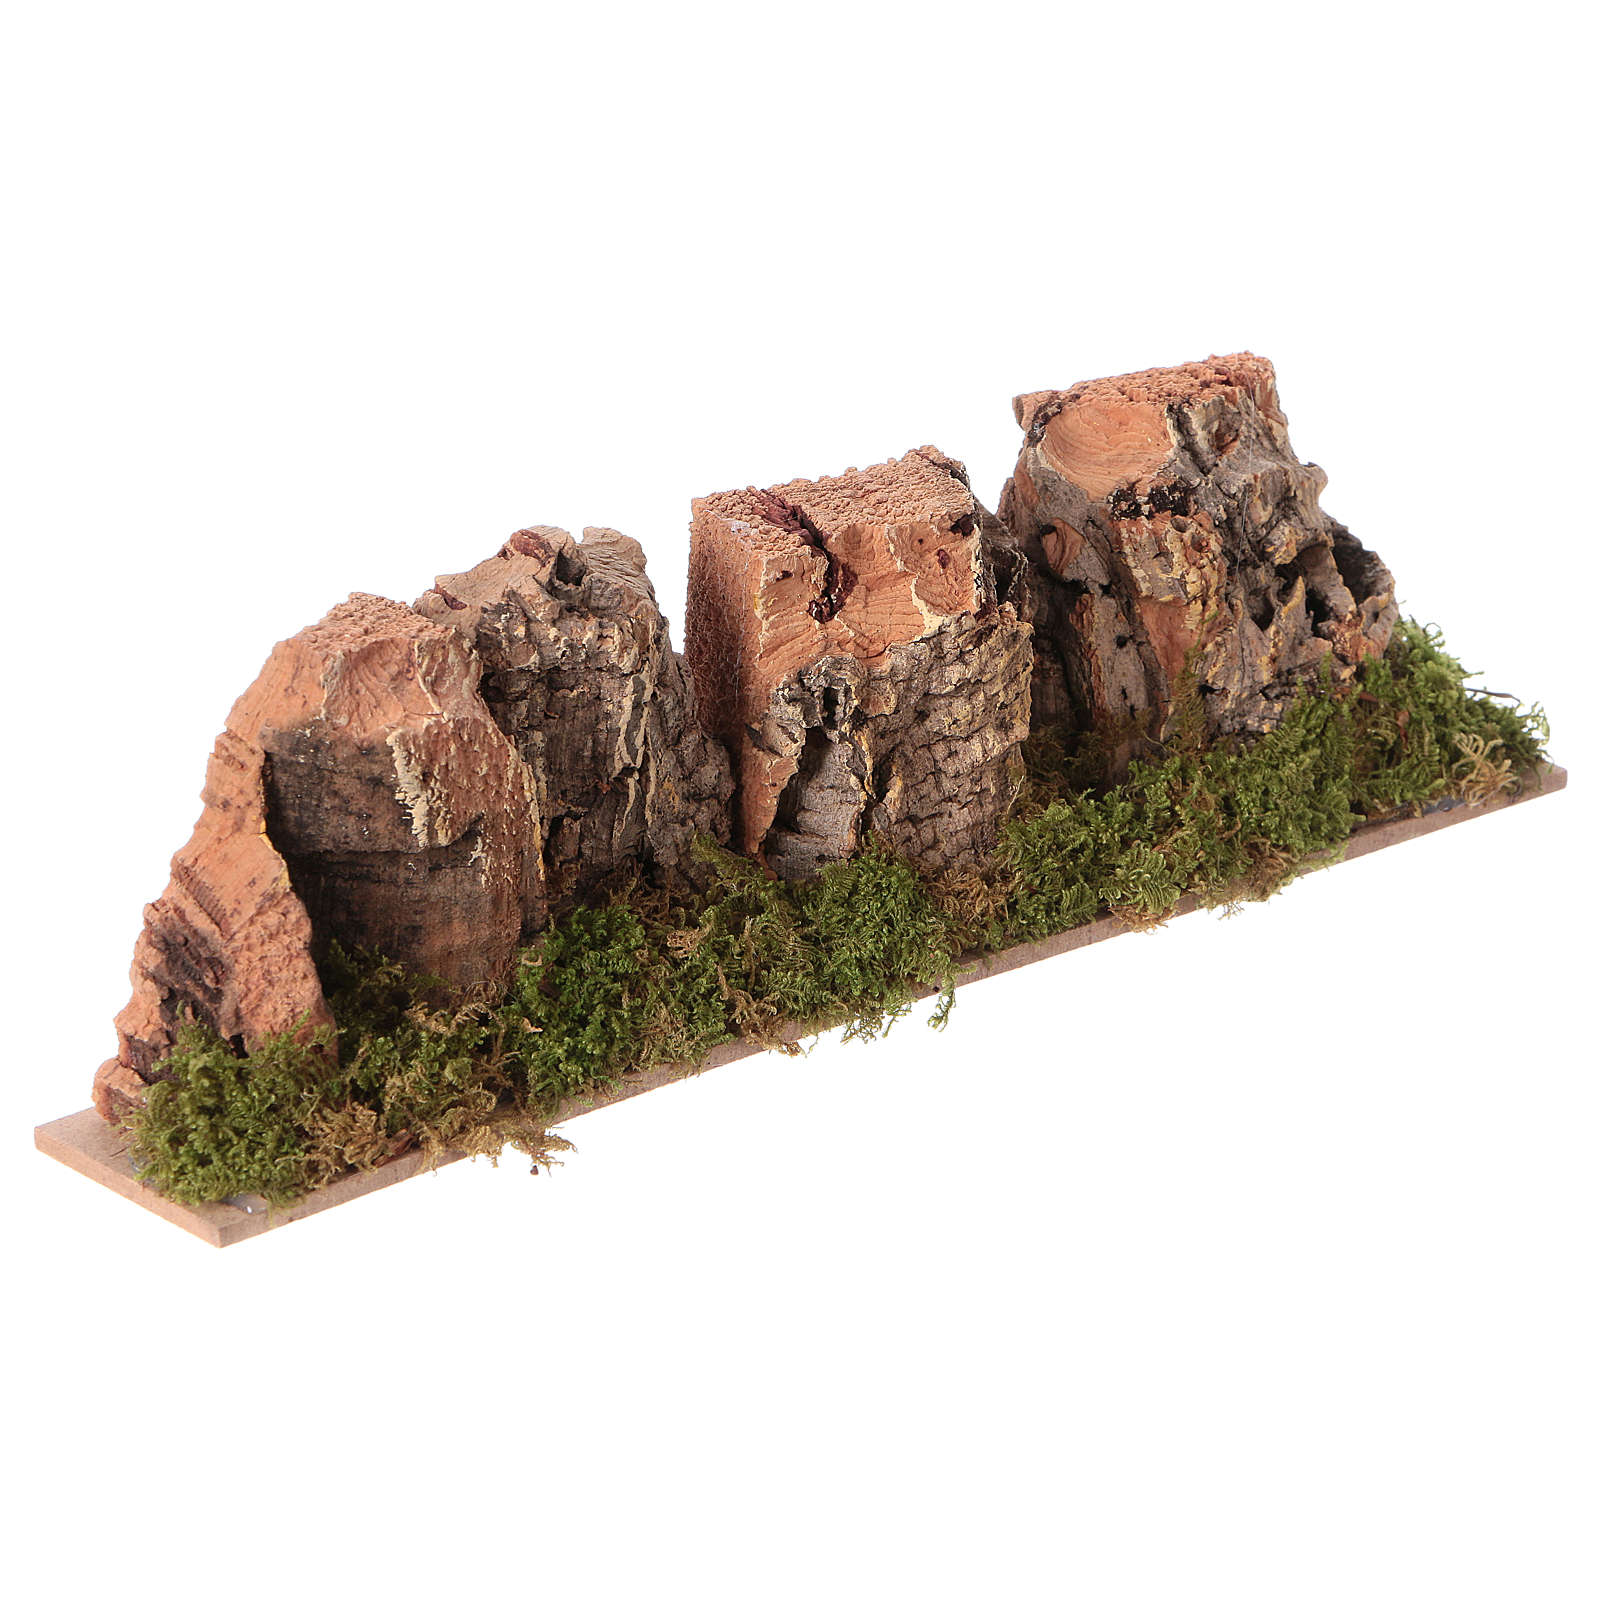 Décor crèche roches en liège 4x24x6 4